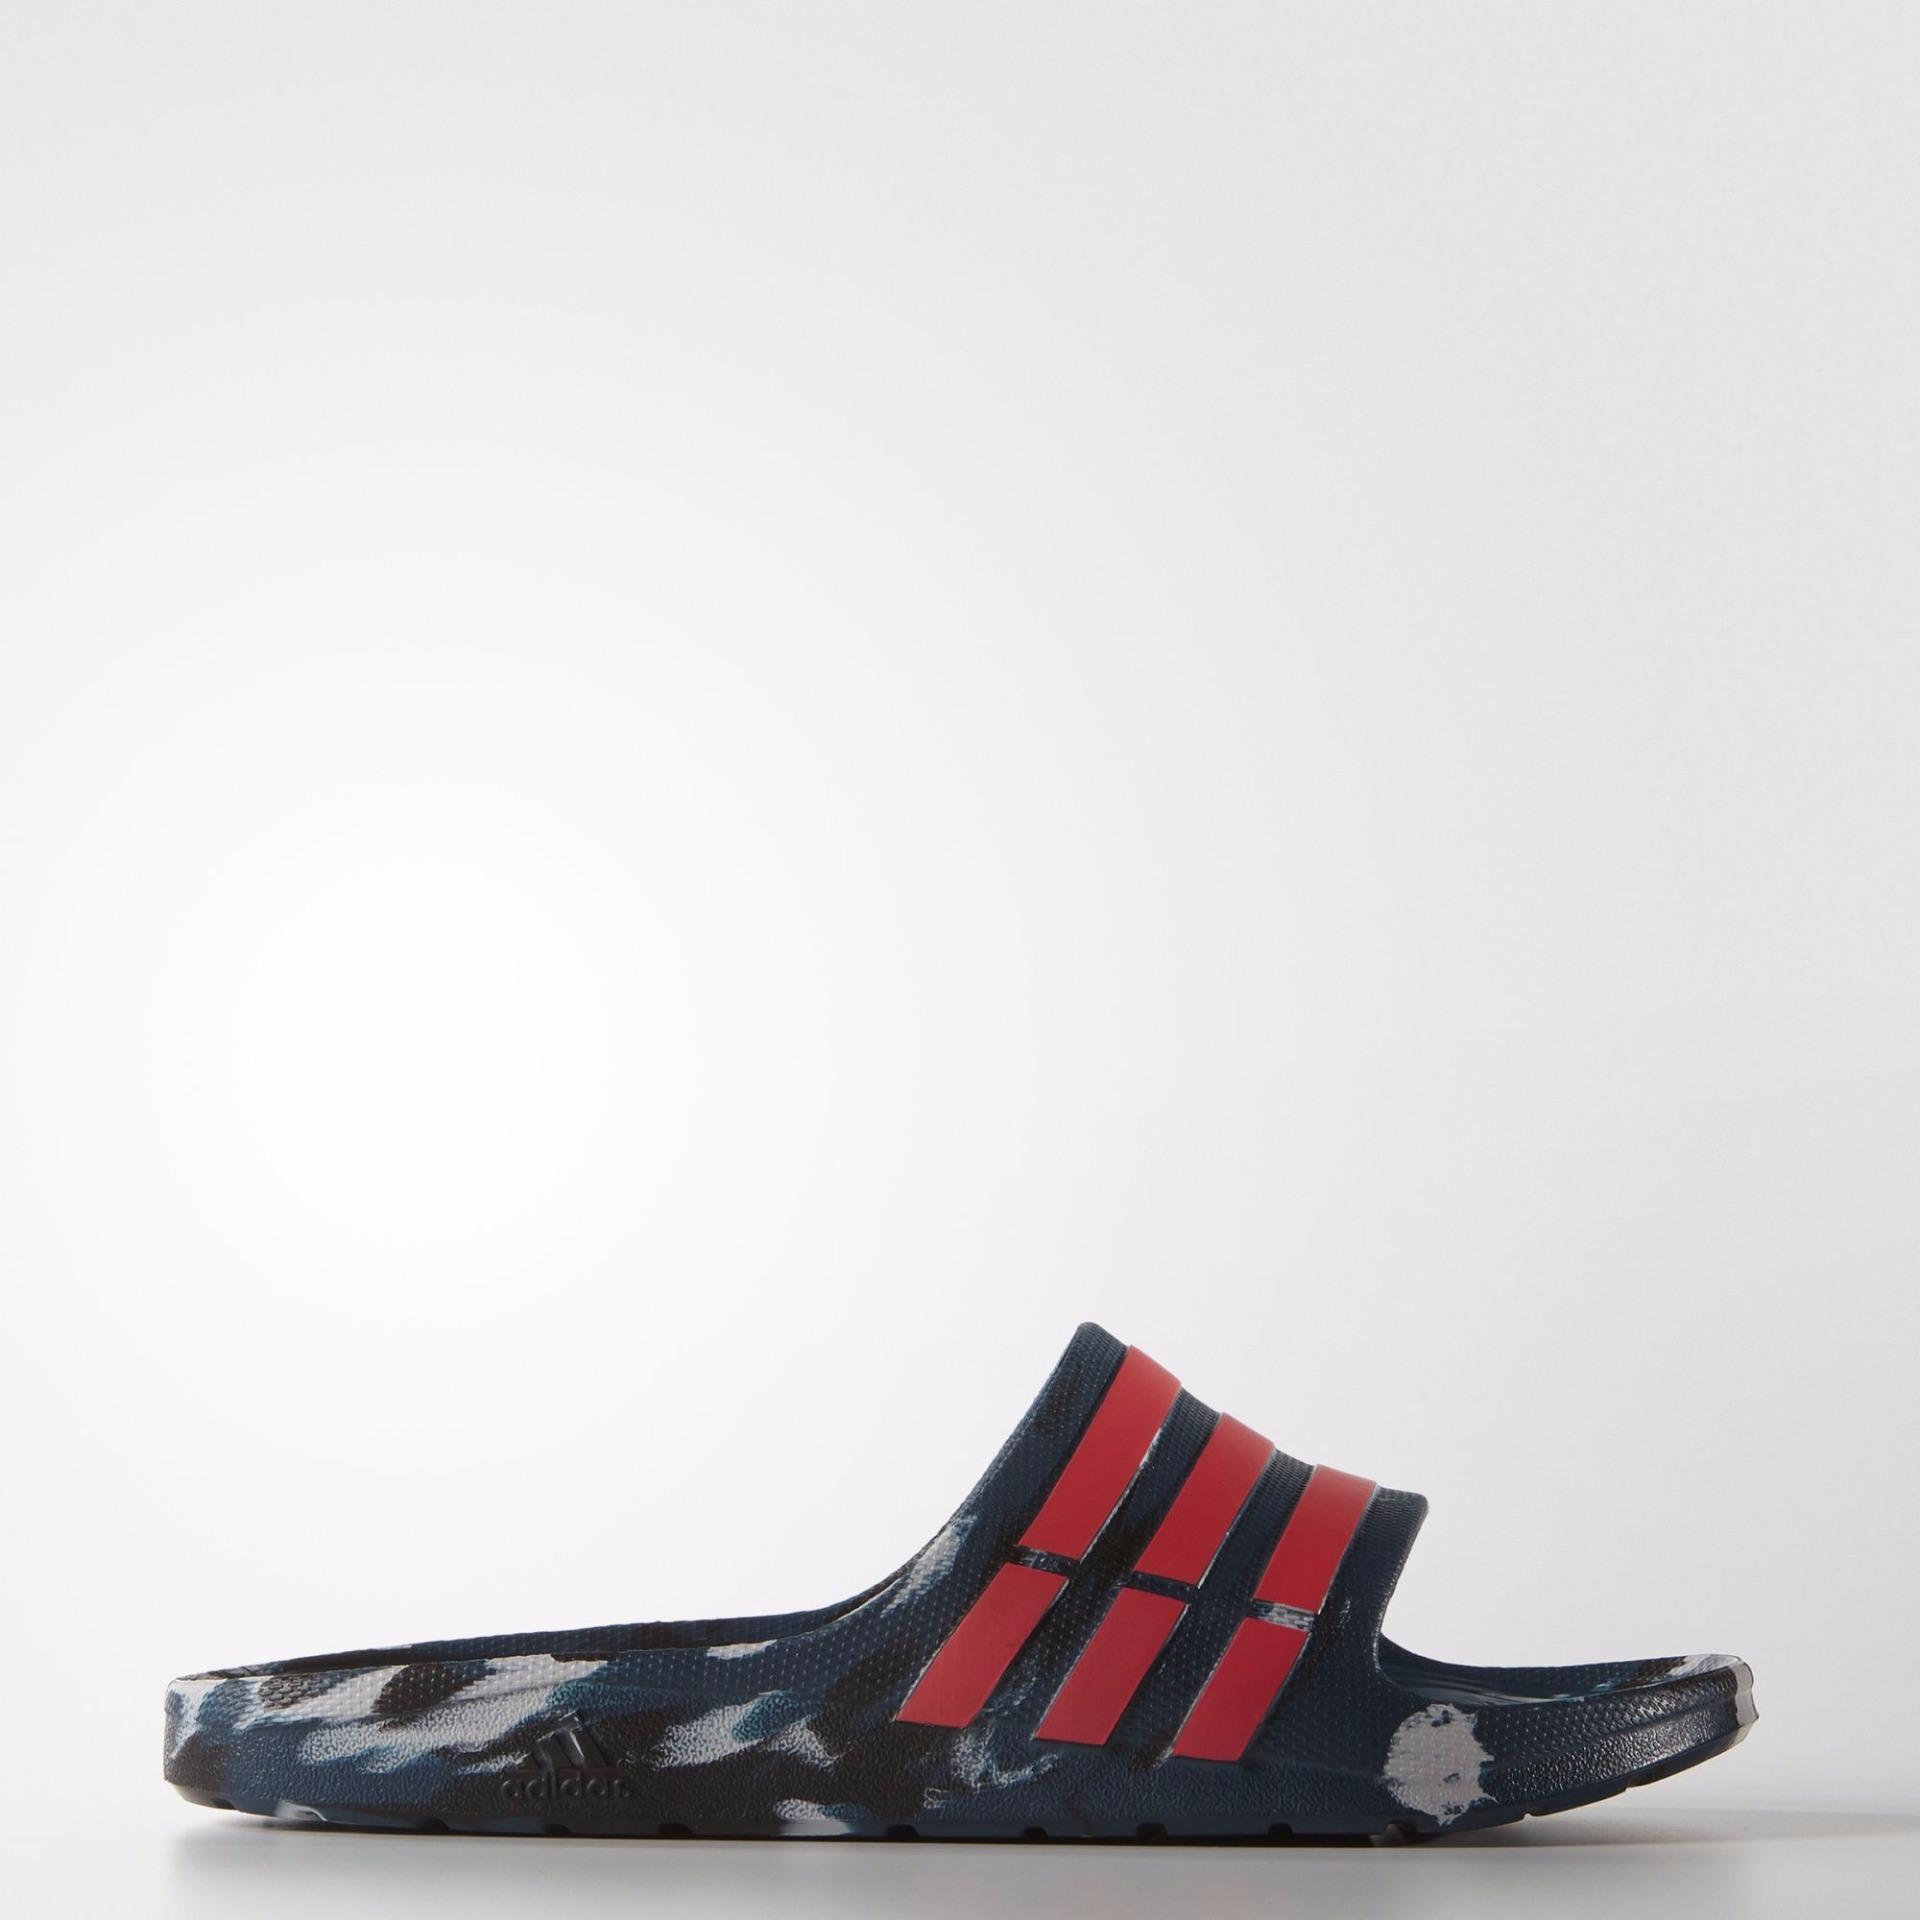 Harga Sandal Adidas Duramo Slide Marble Navy Red Aq5257 Adidas